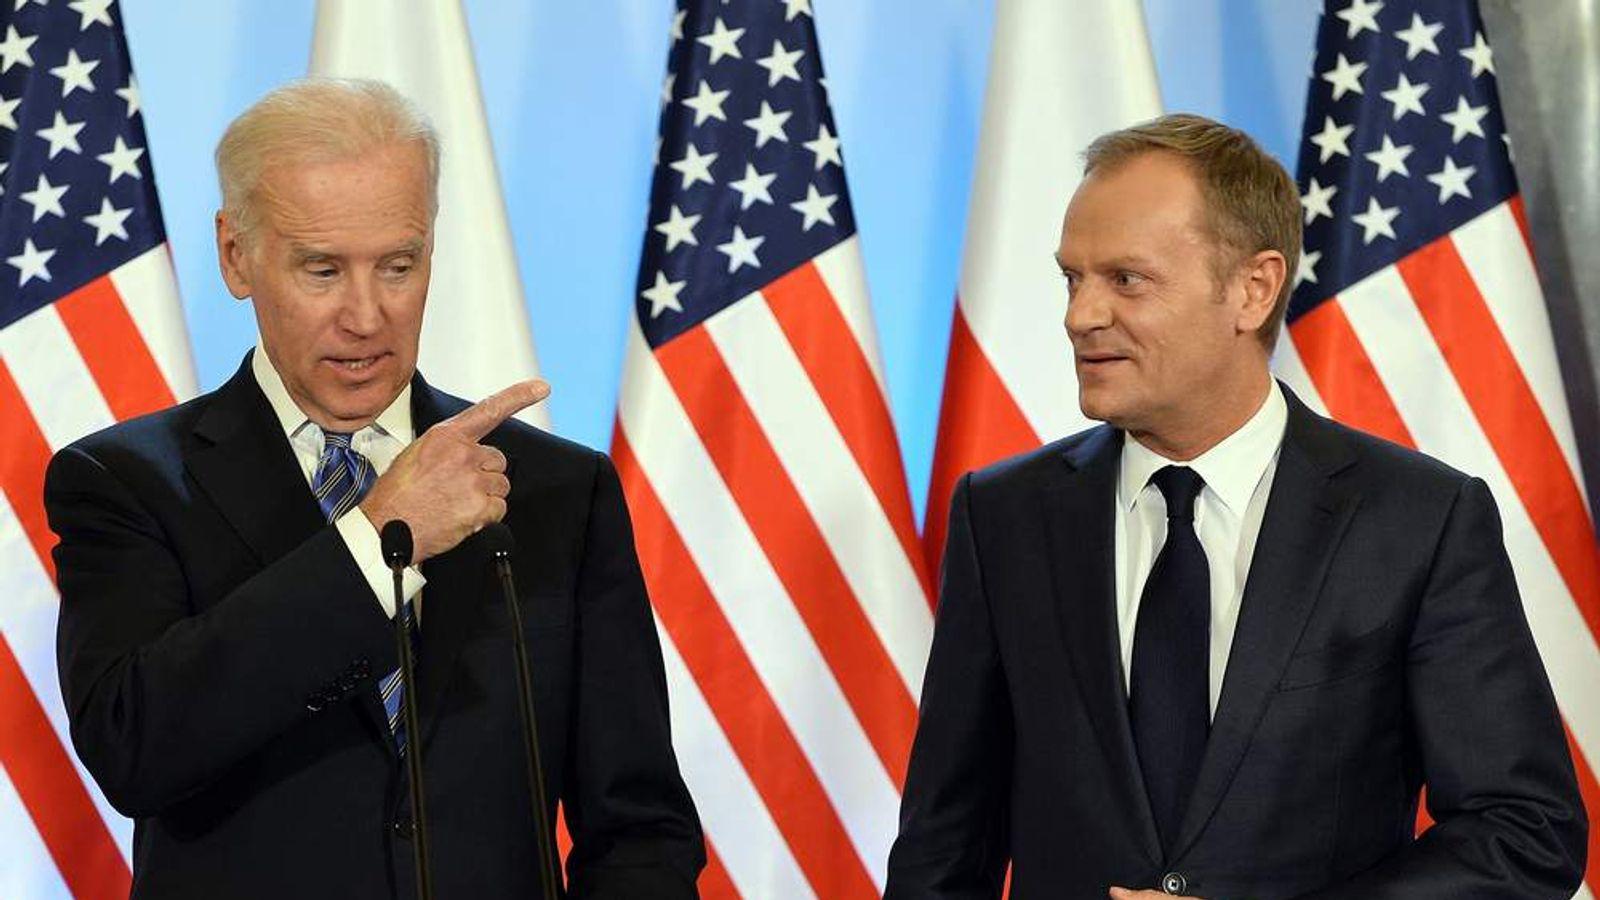 Joe Biden (L) meets Donald Tusk